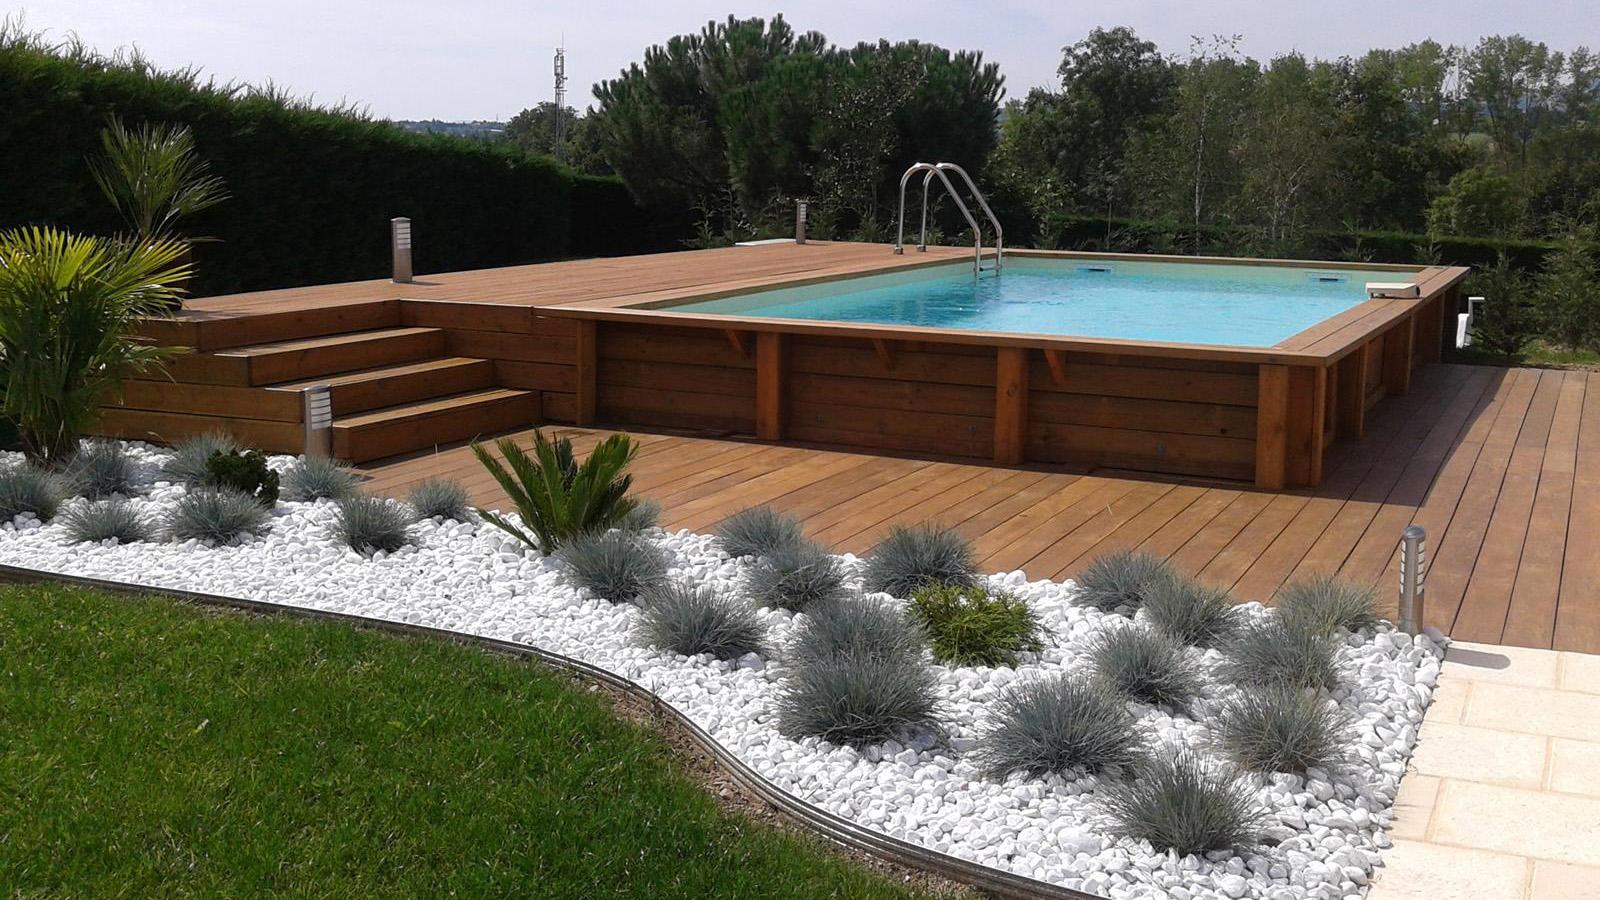 Terrasse Bois Avec Piscine Hors Sol concernant Sur Quoi Poser Une Piscine Hors Sol